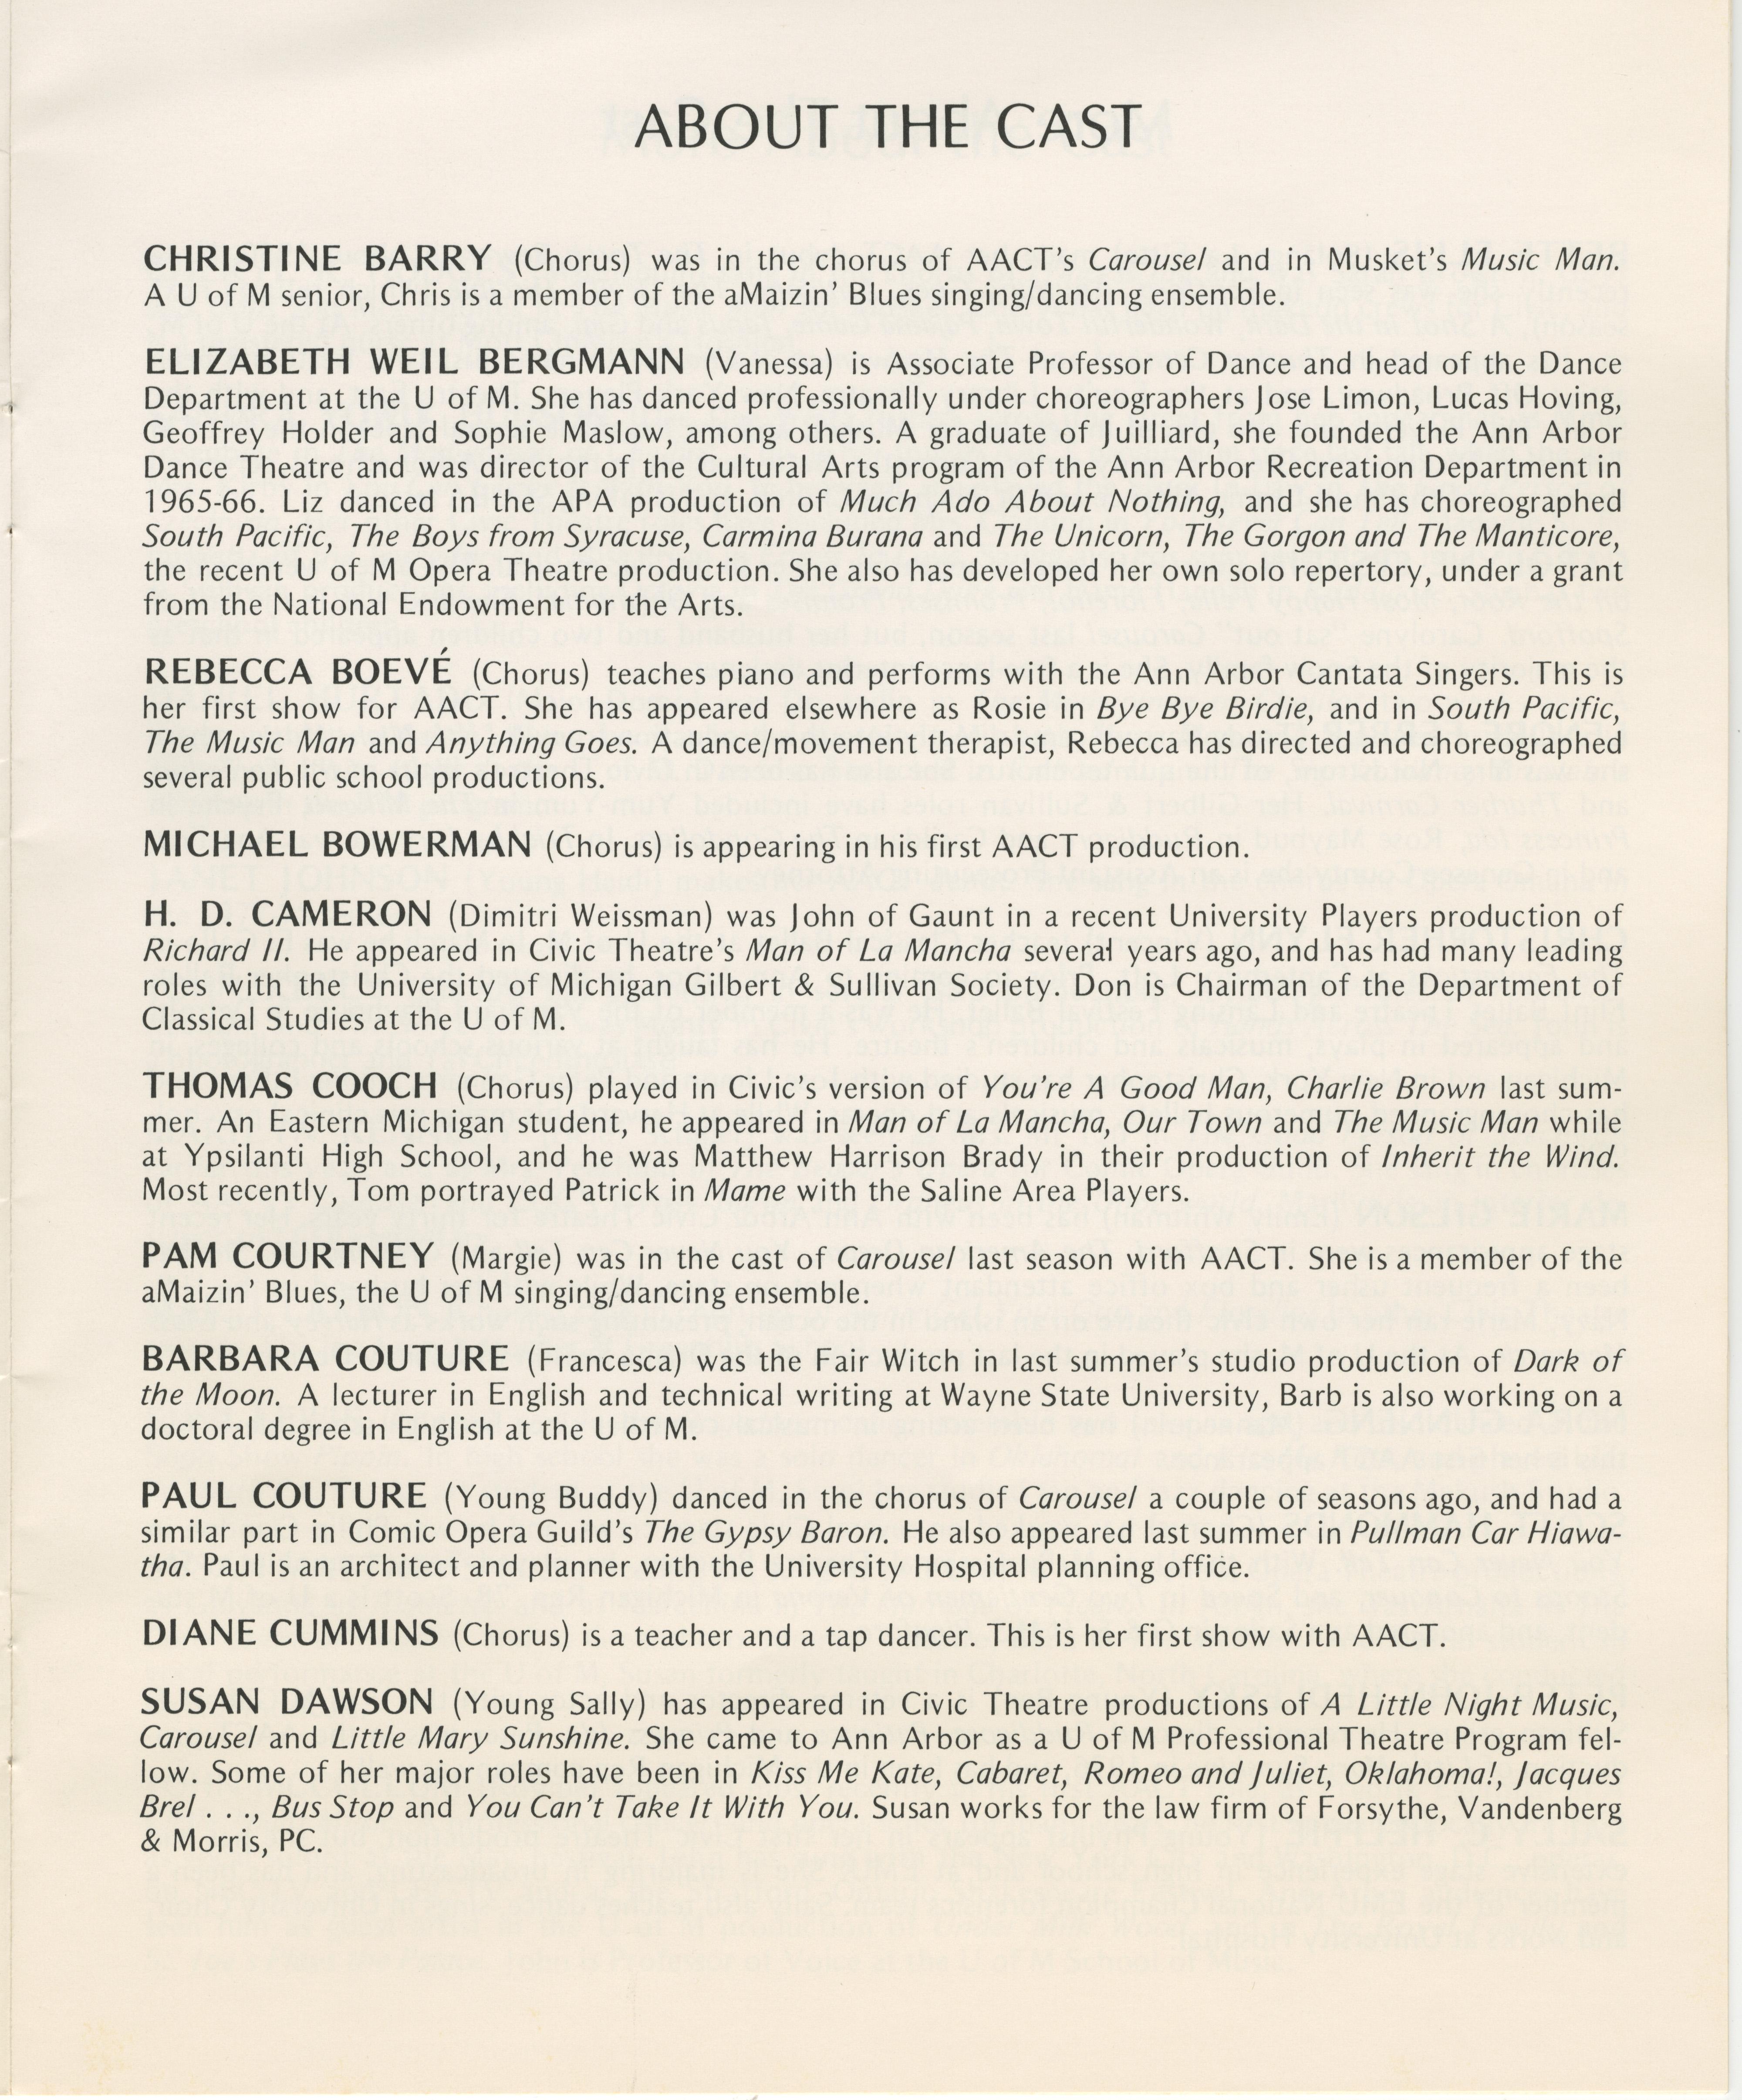 Ann Arbor Civic Theatre Program: Follies, May 31, 1979